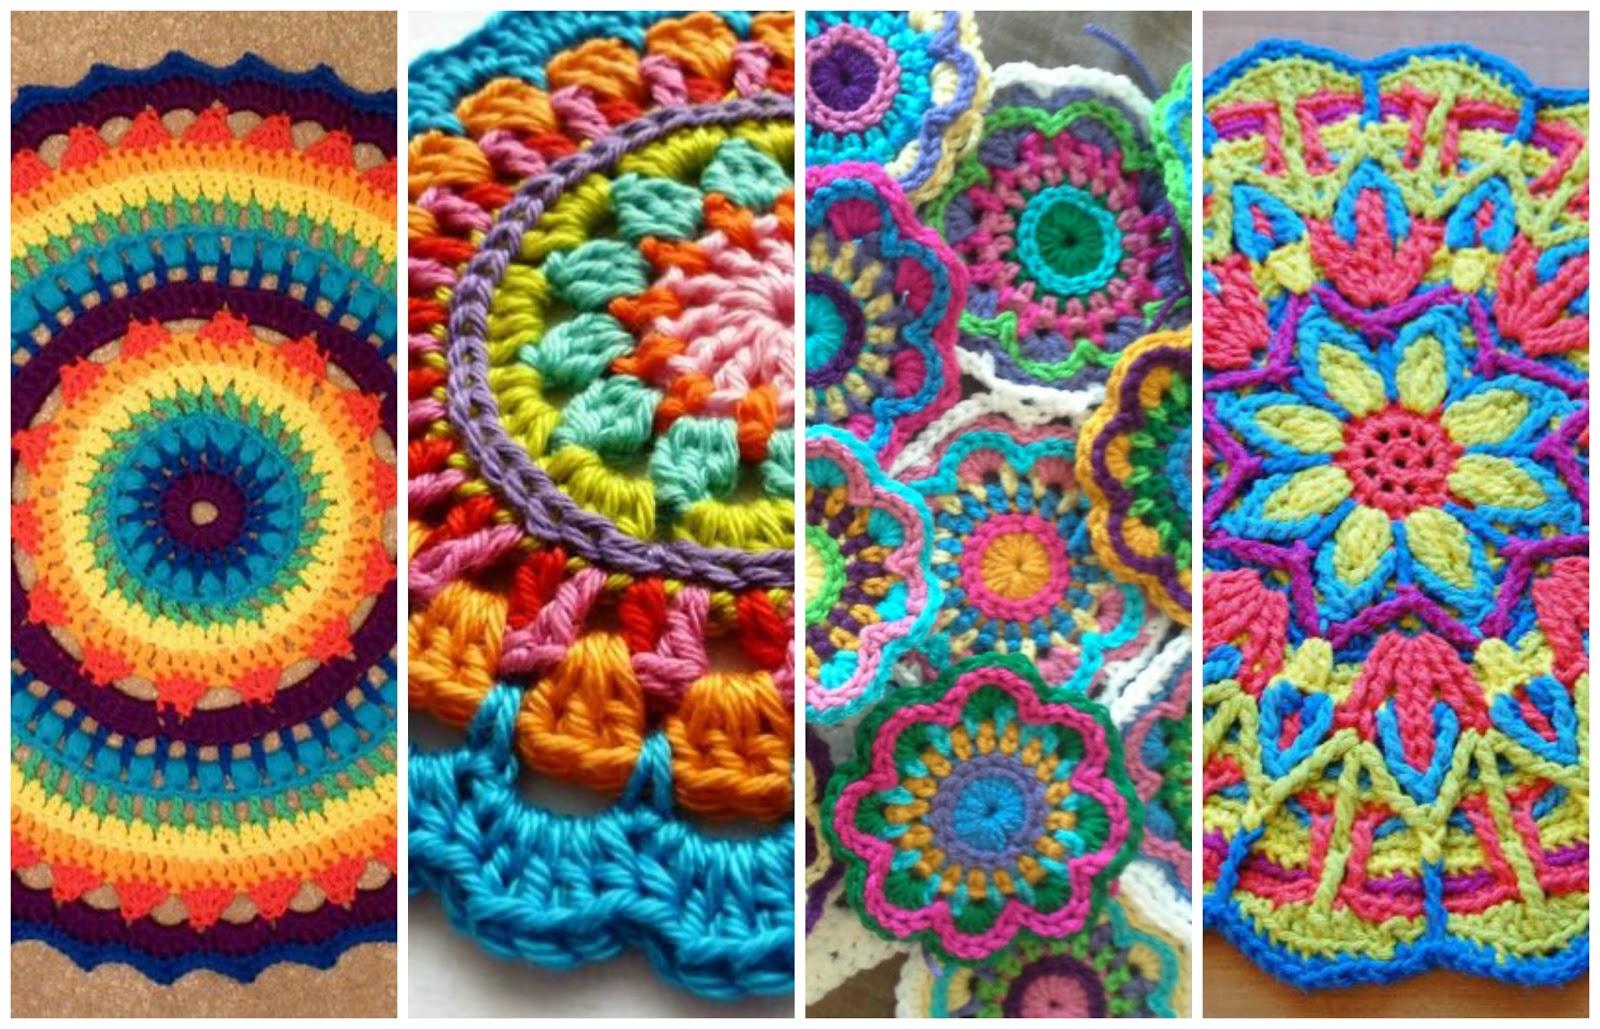 Reciclando con erika mandalas a crochet v deo tutorial - Manualidades de ganchillo para navidad ...